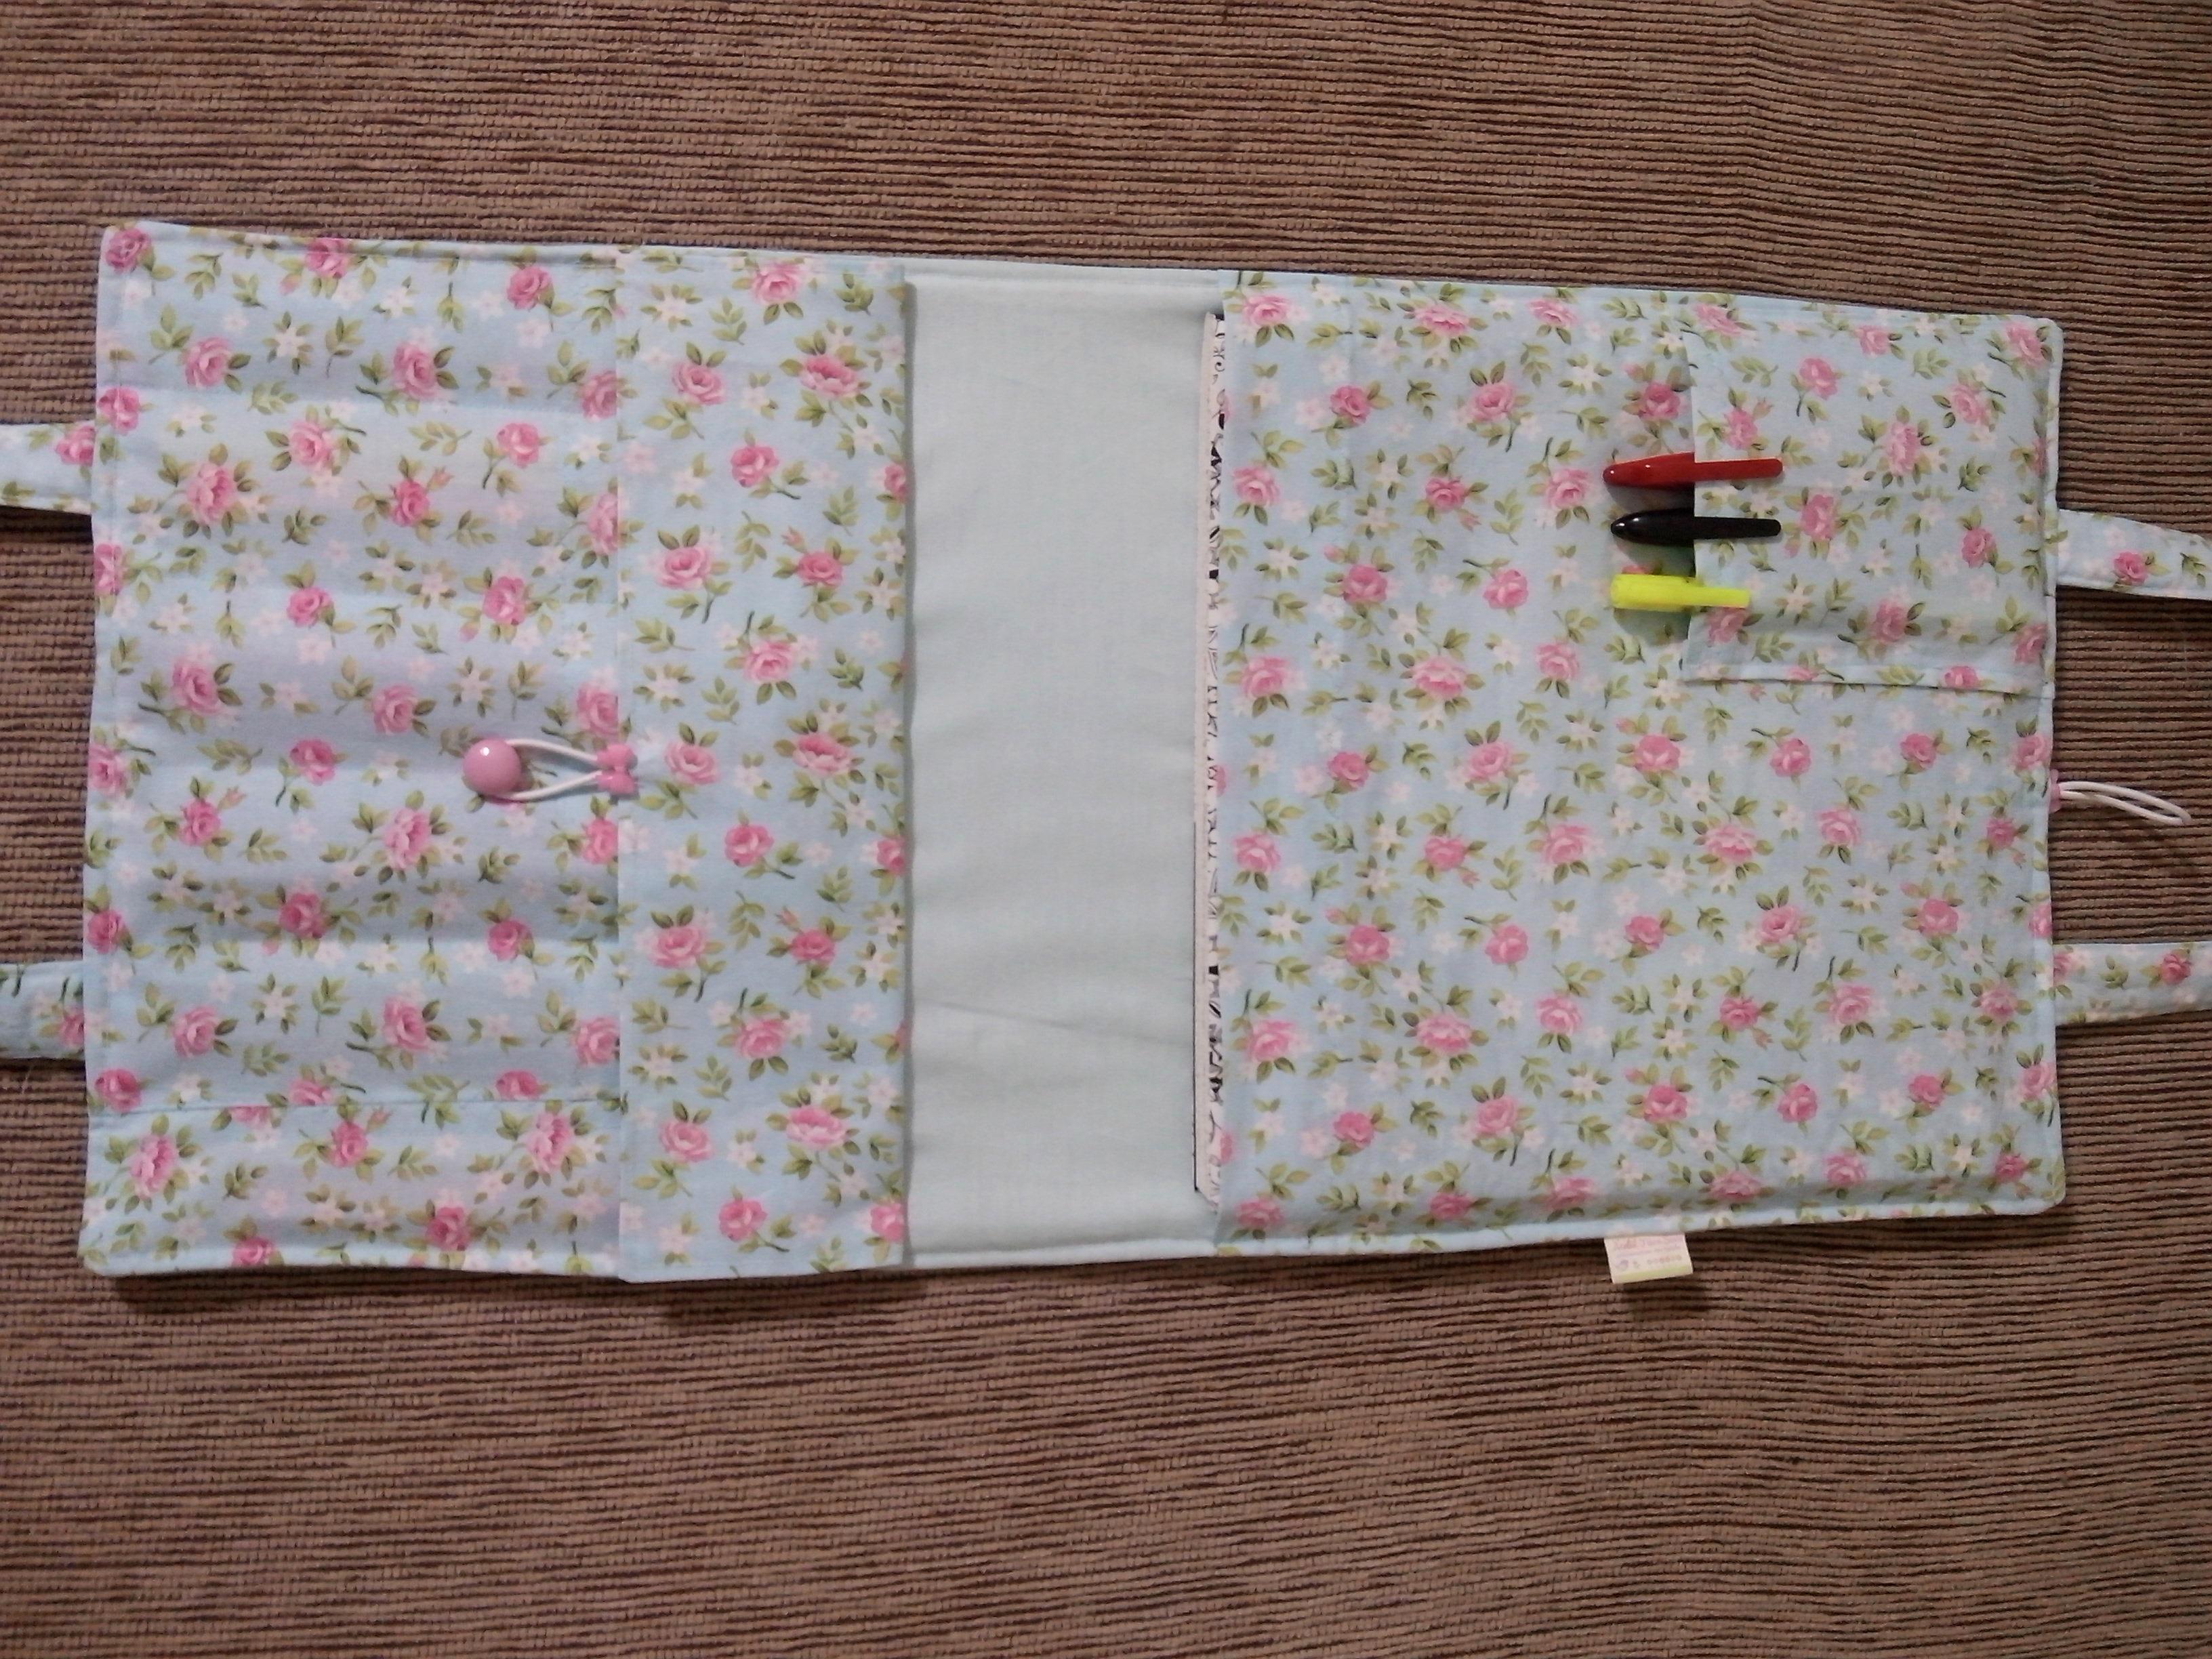 flores jardim secreto:porta livro jardim secreto porta livro jardim secreto e lapis de cor